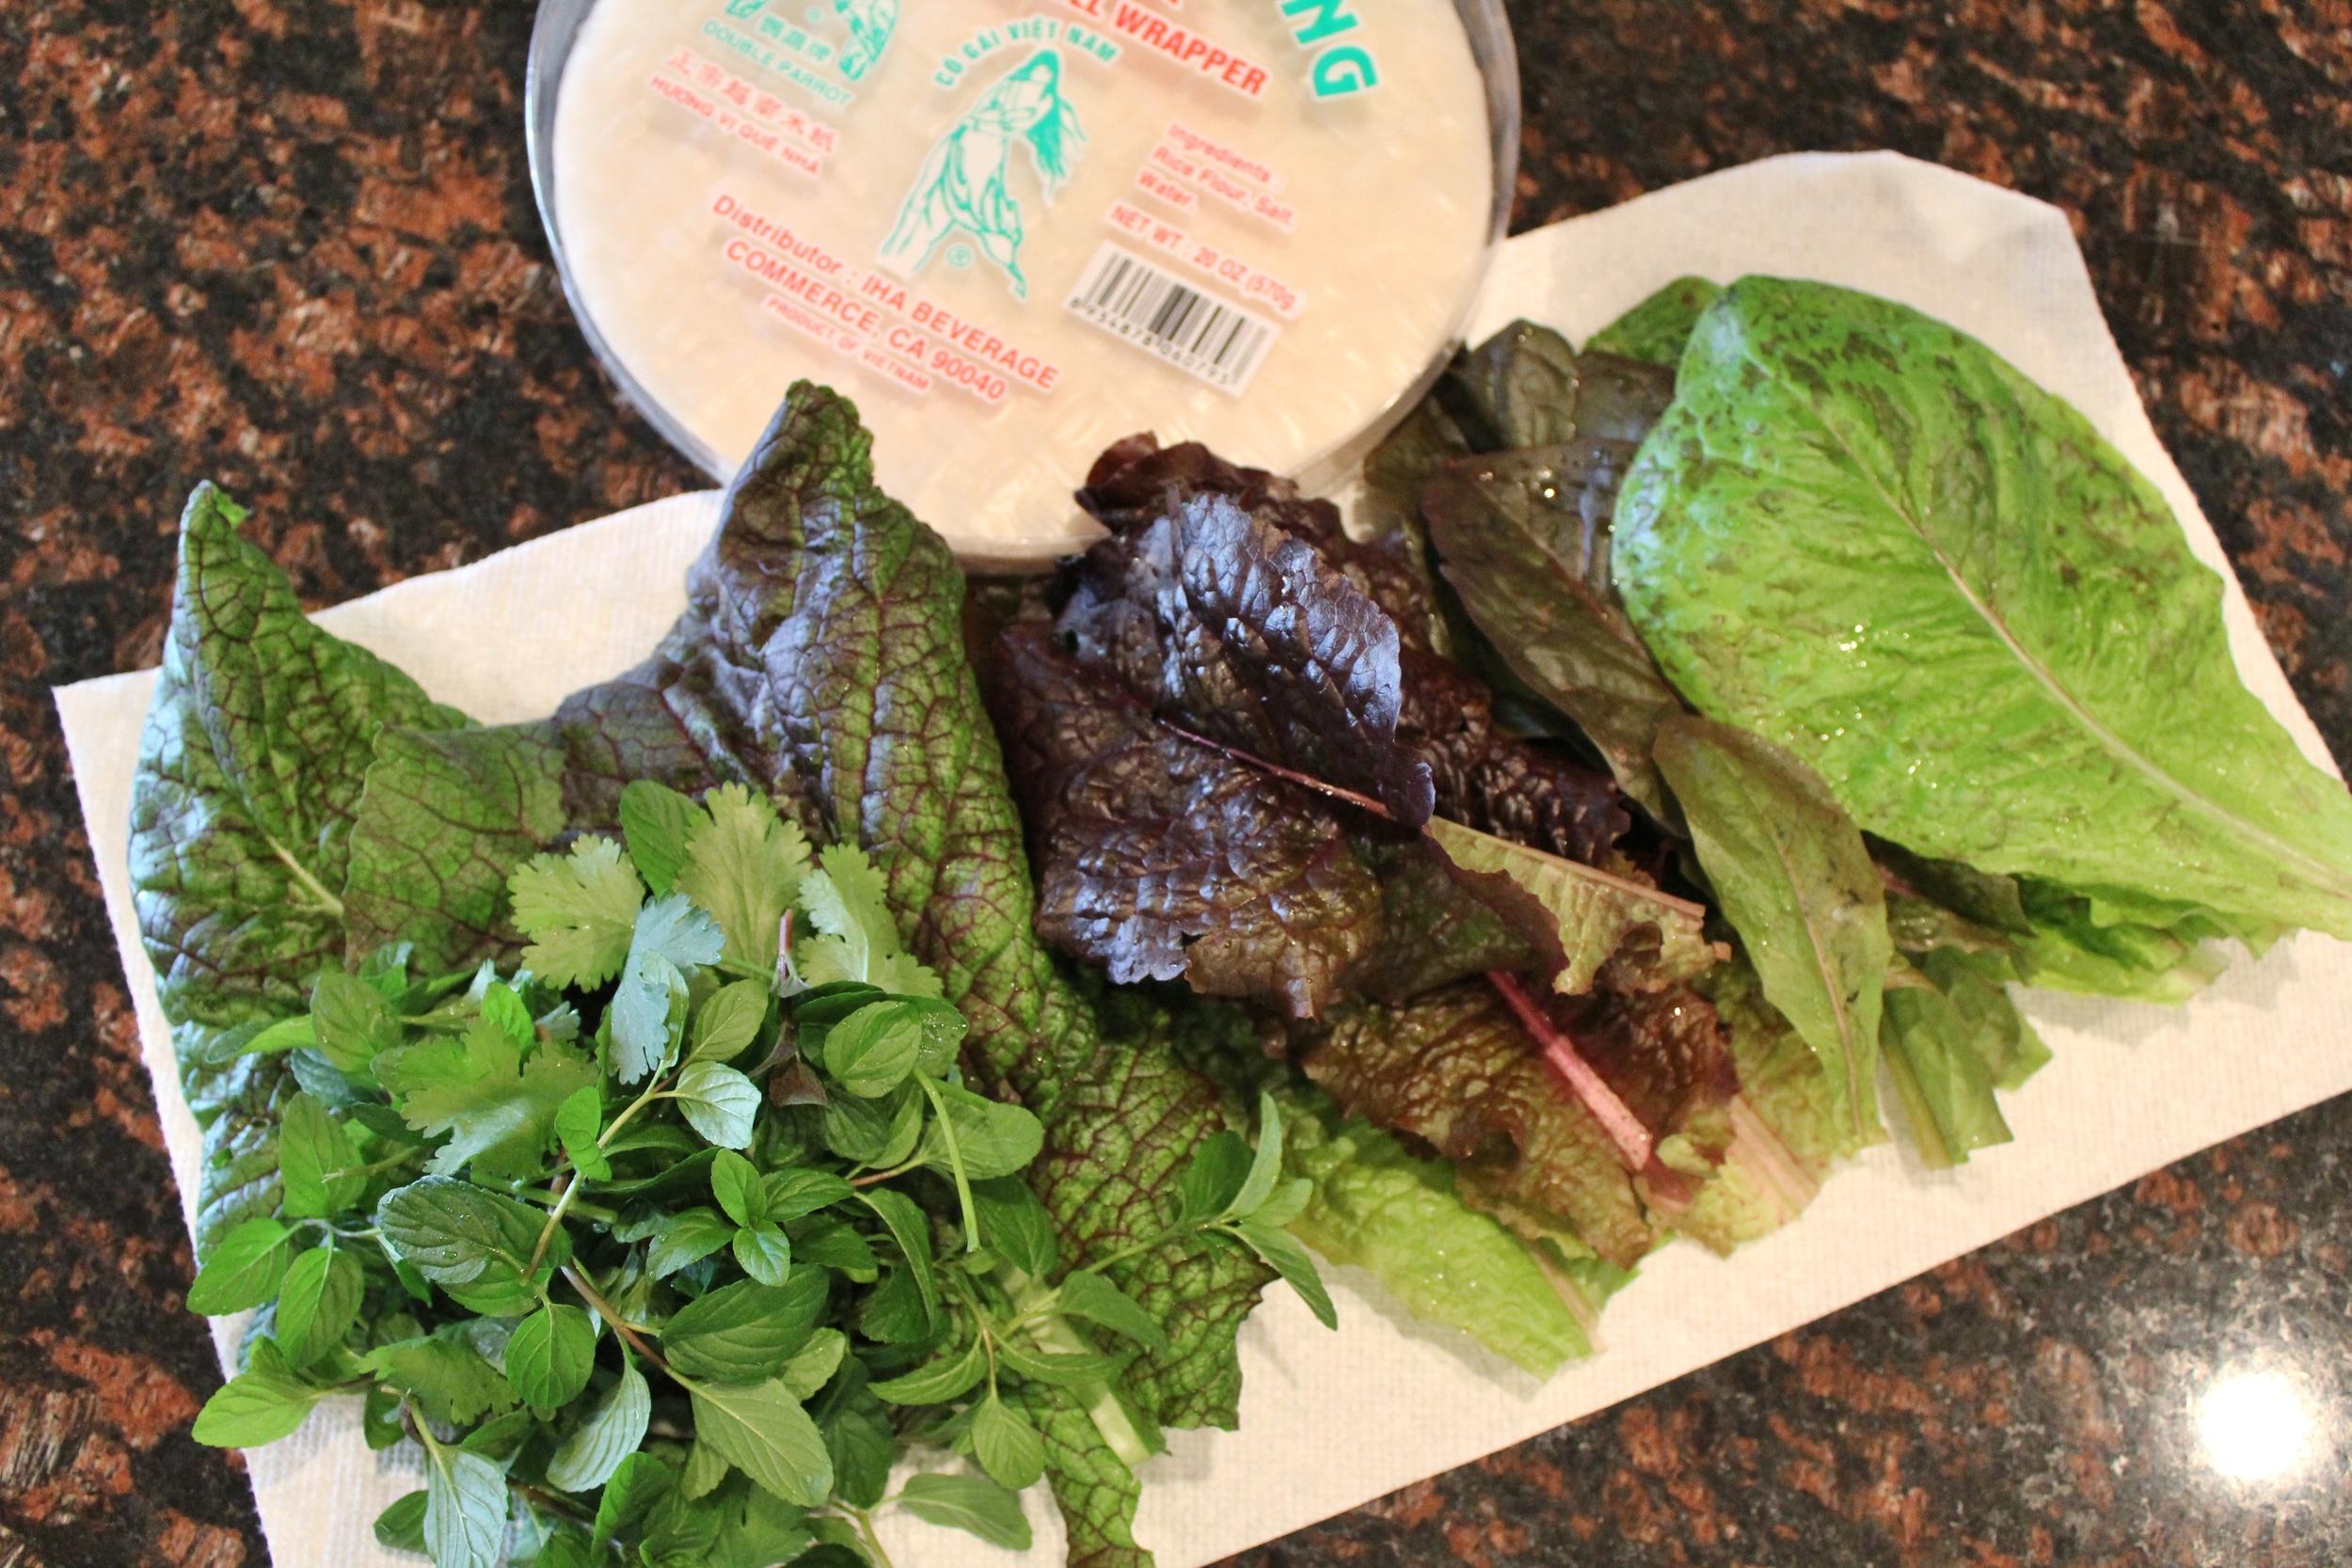 Gardening in Phoenix lettuce Outredgeous